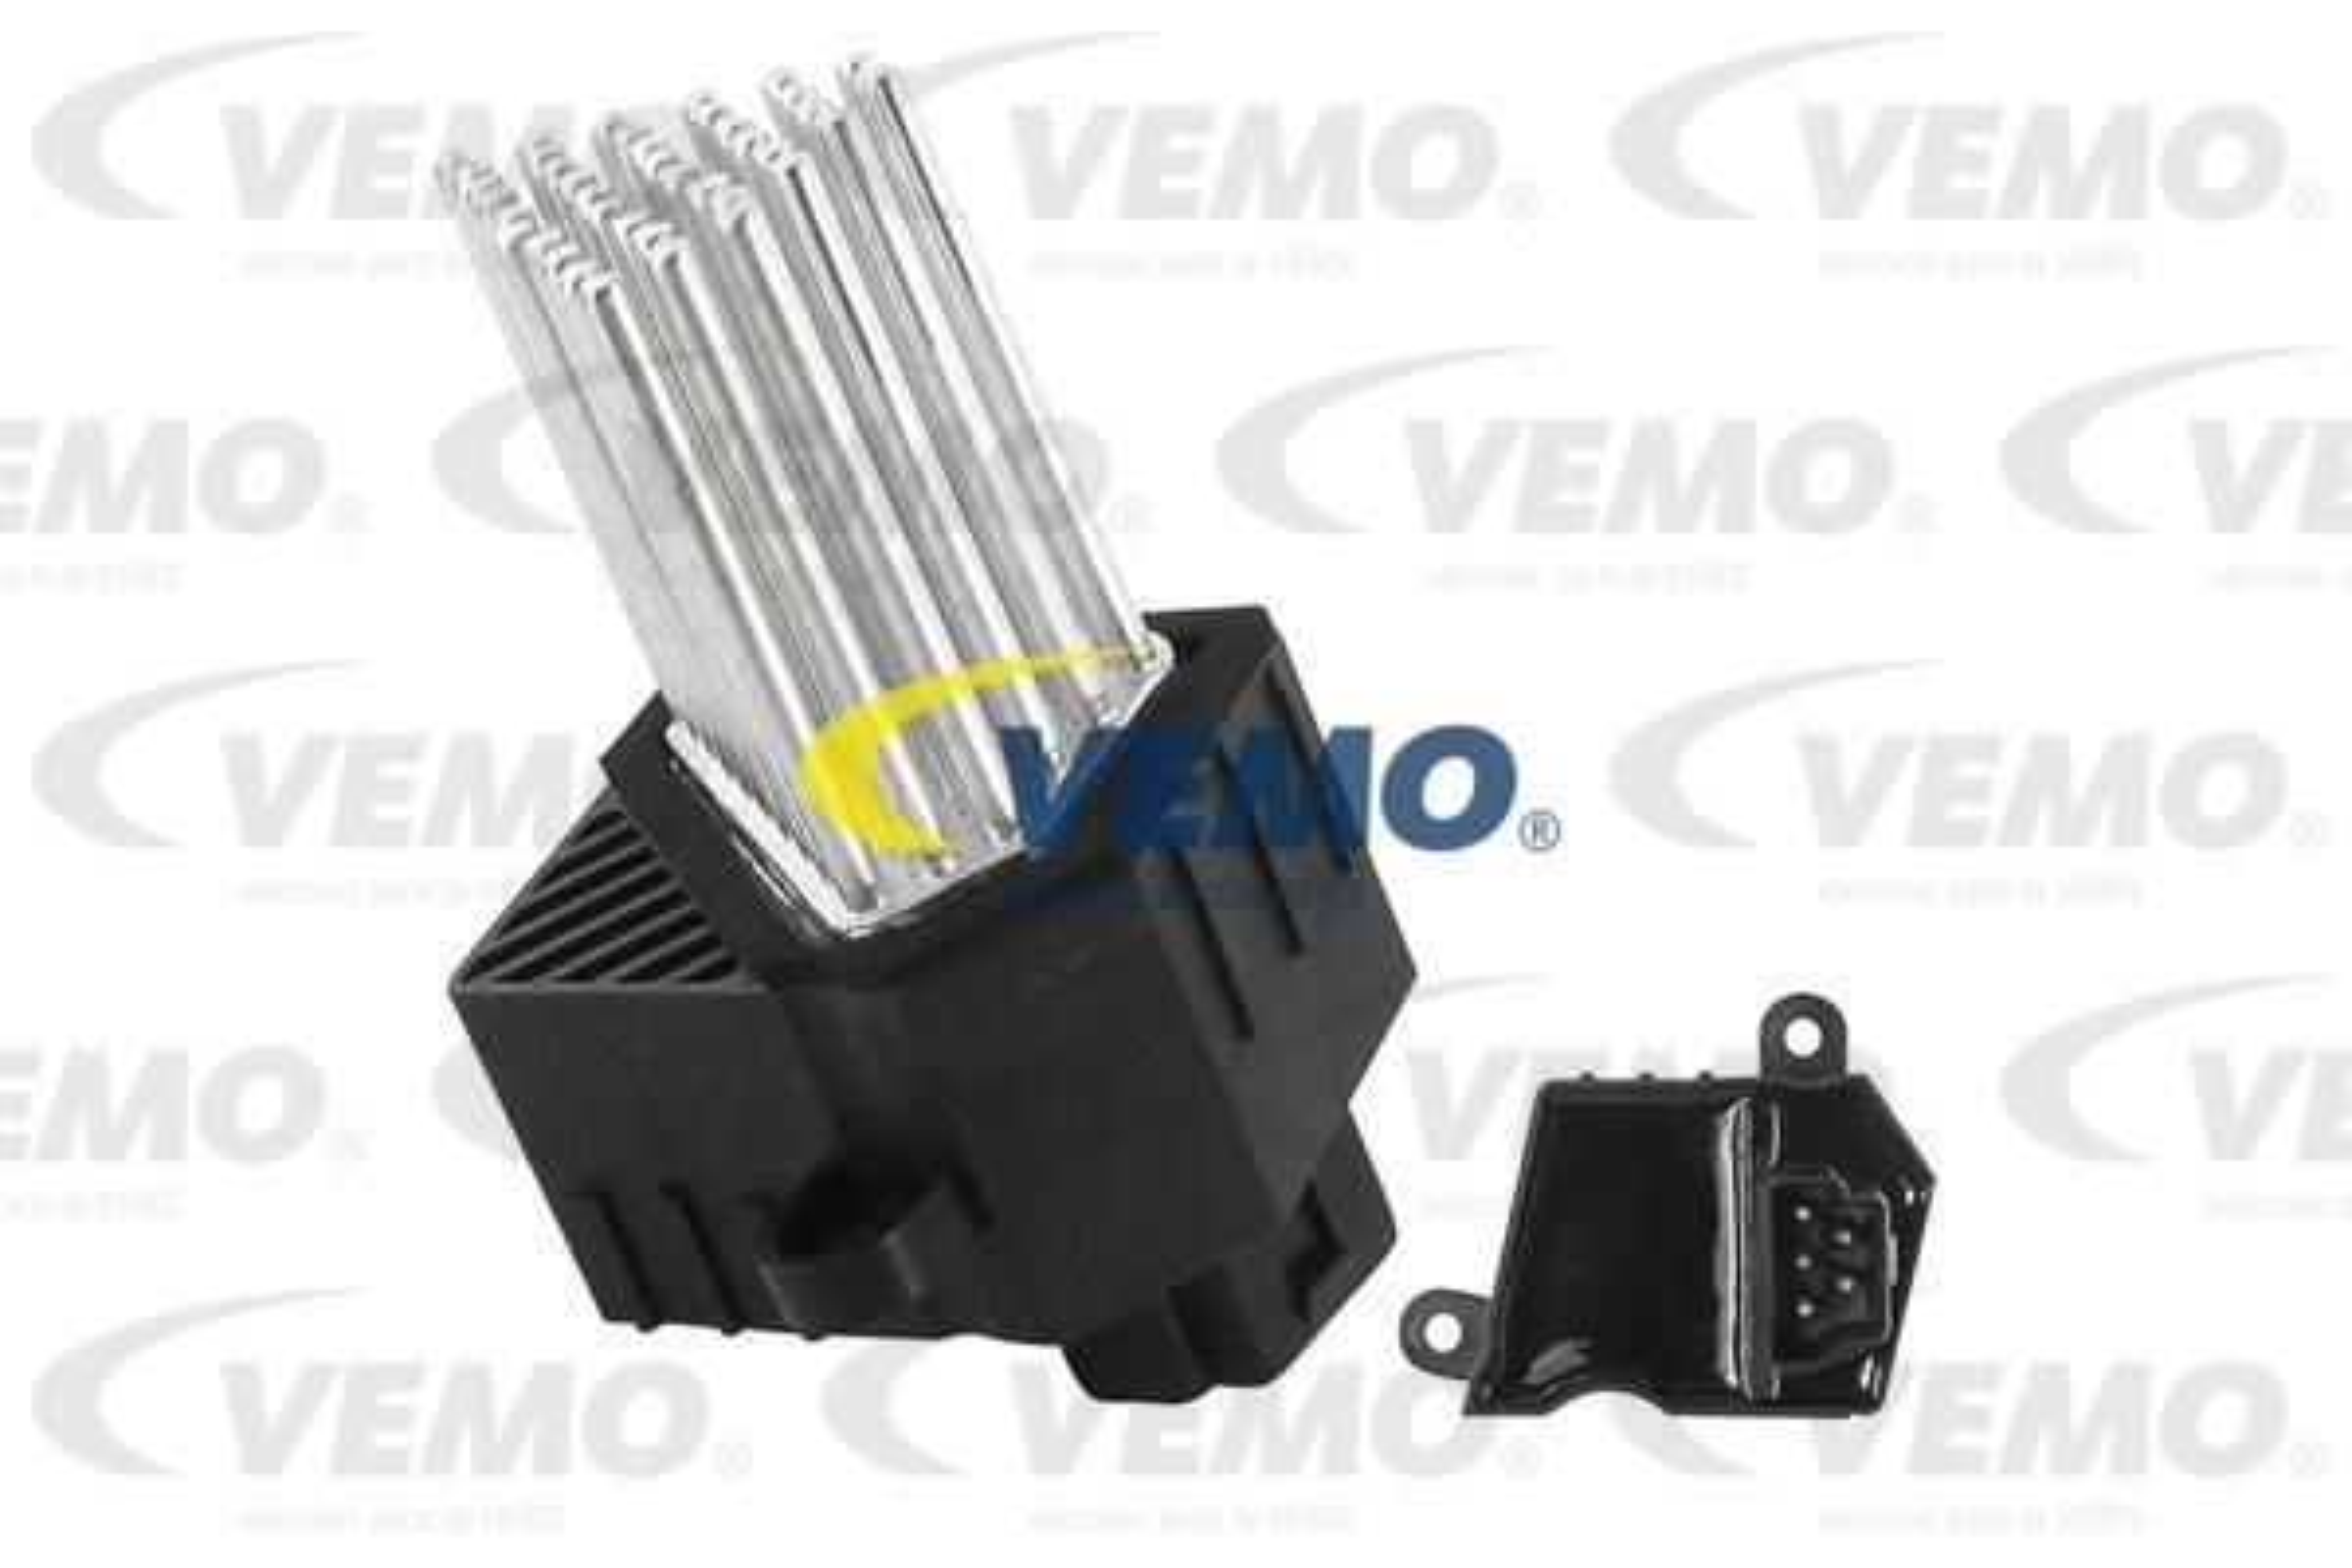 Régulateur, pulseur d'air habitacle VEMO V20-79-0001-1 Avis